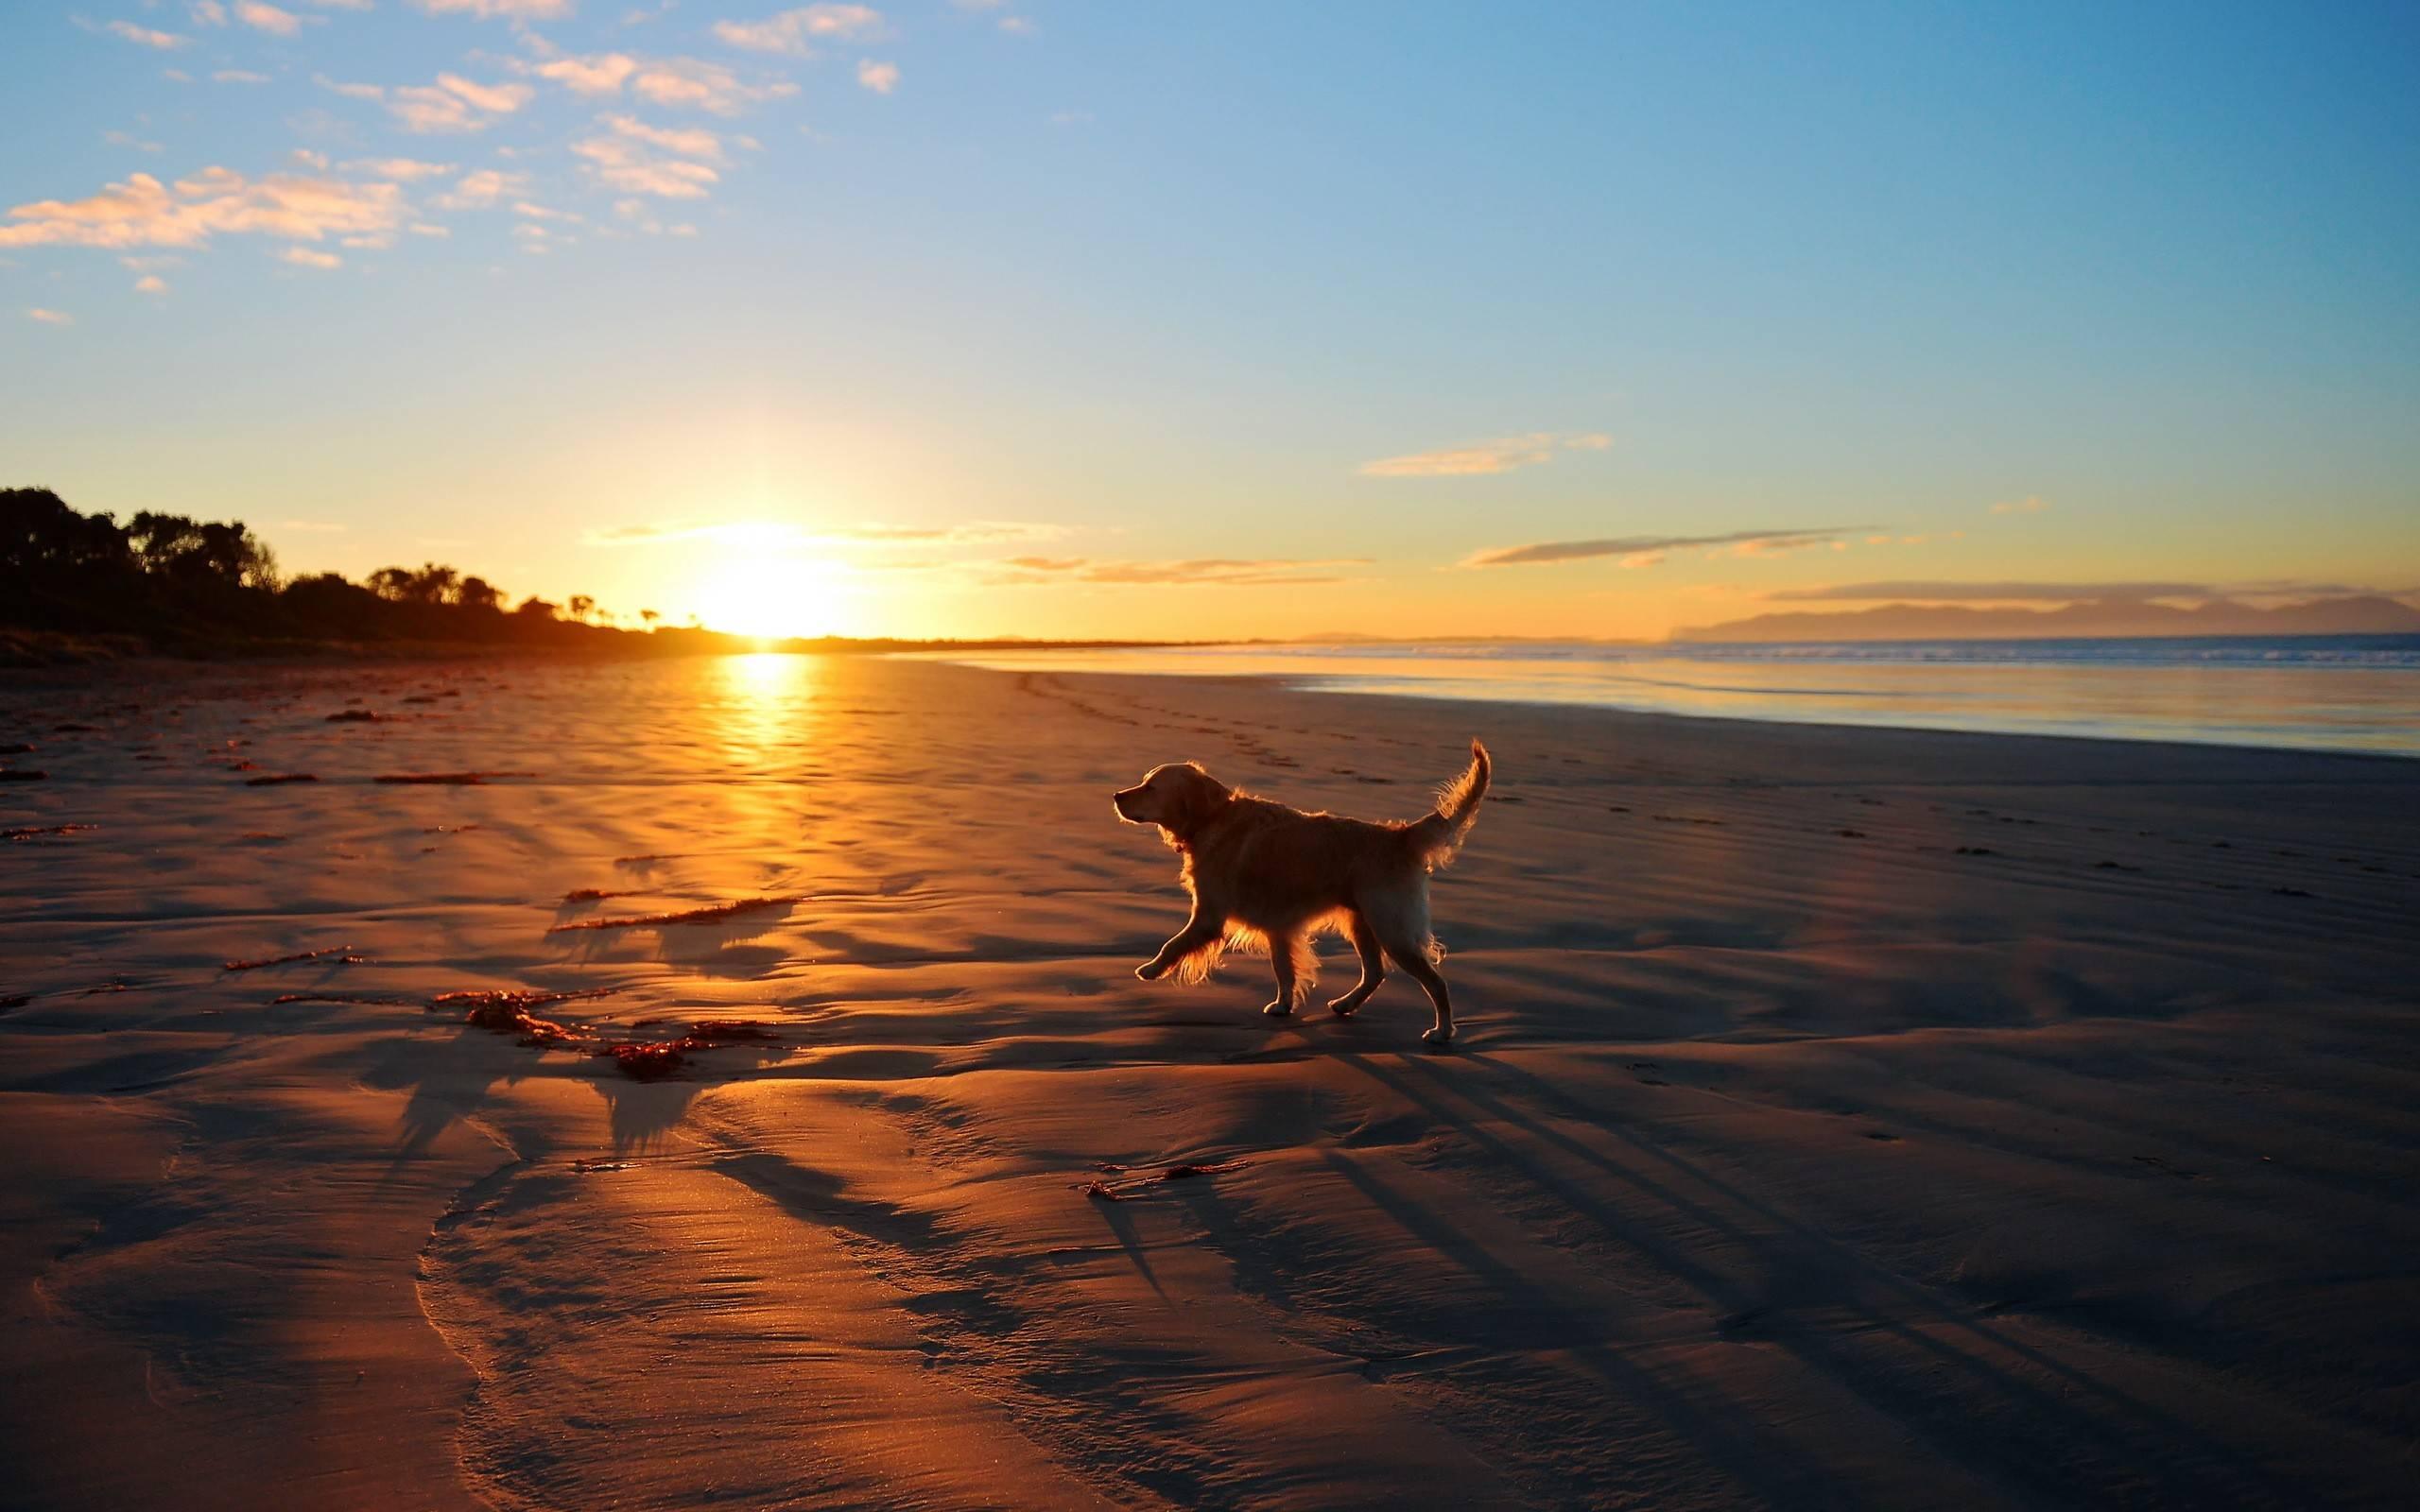 [47+] Dogs on the Beach Wallpaper on WallpaperSafari